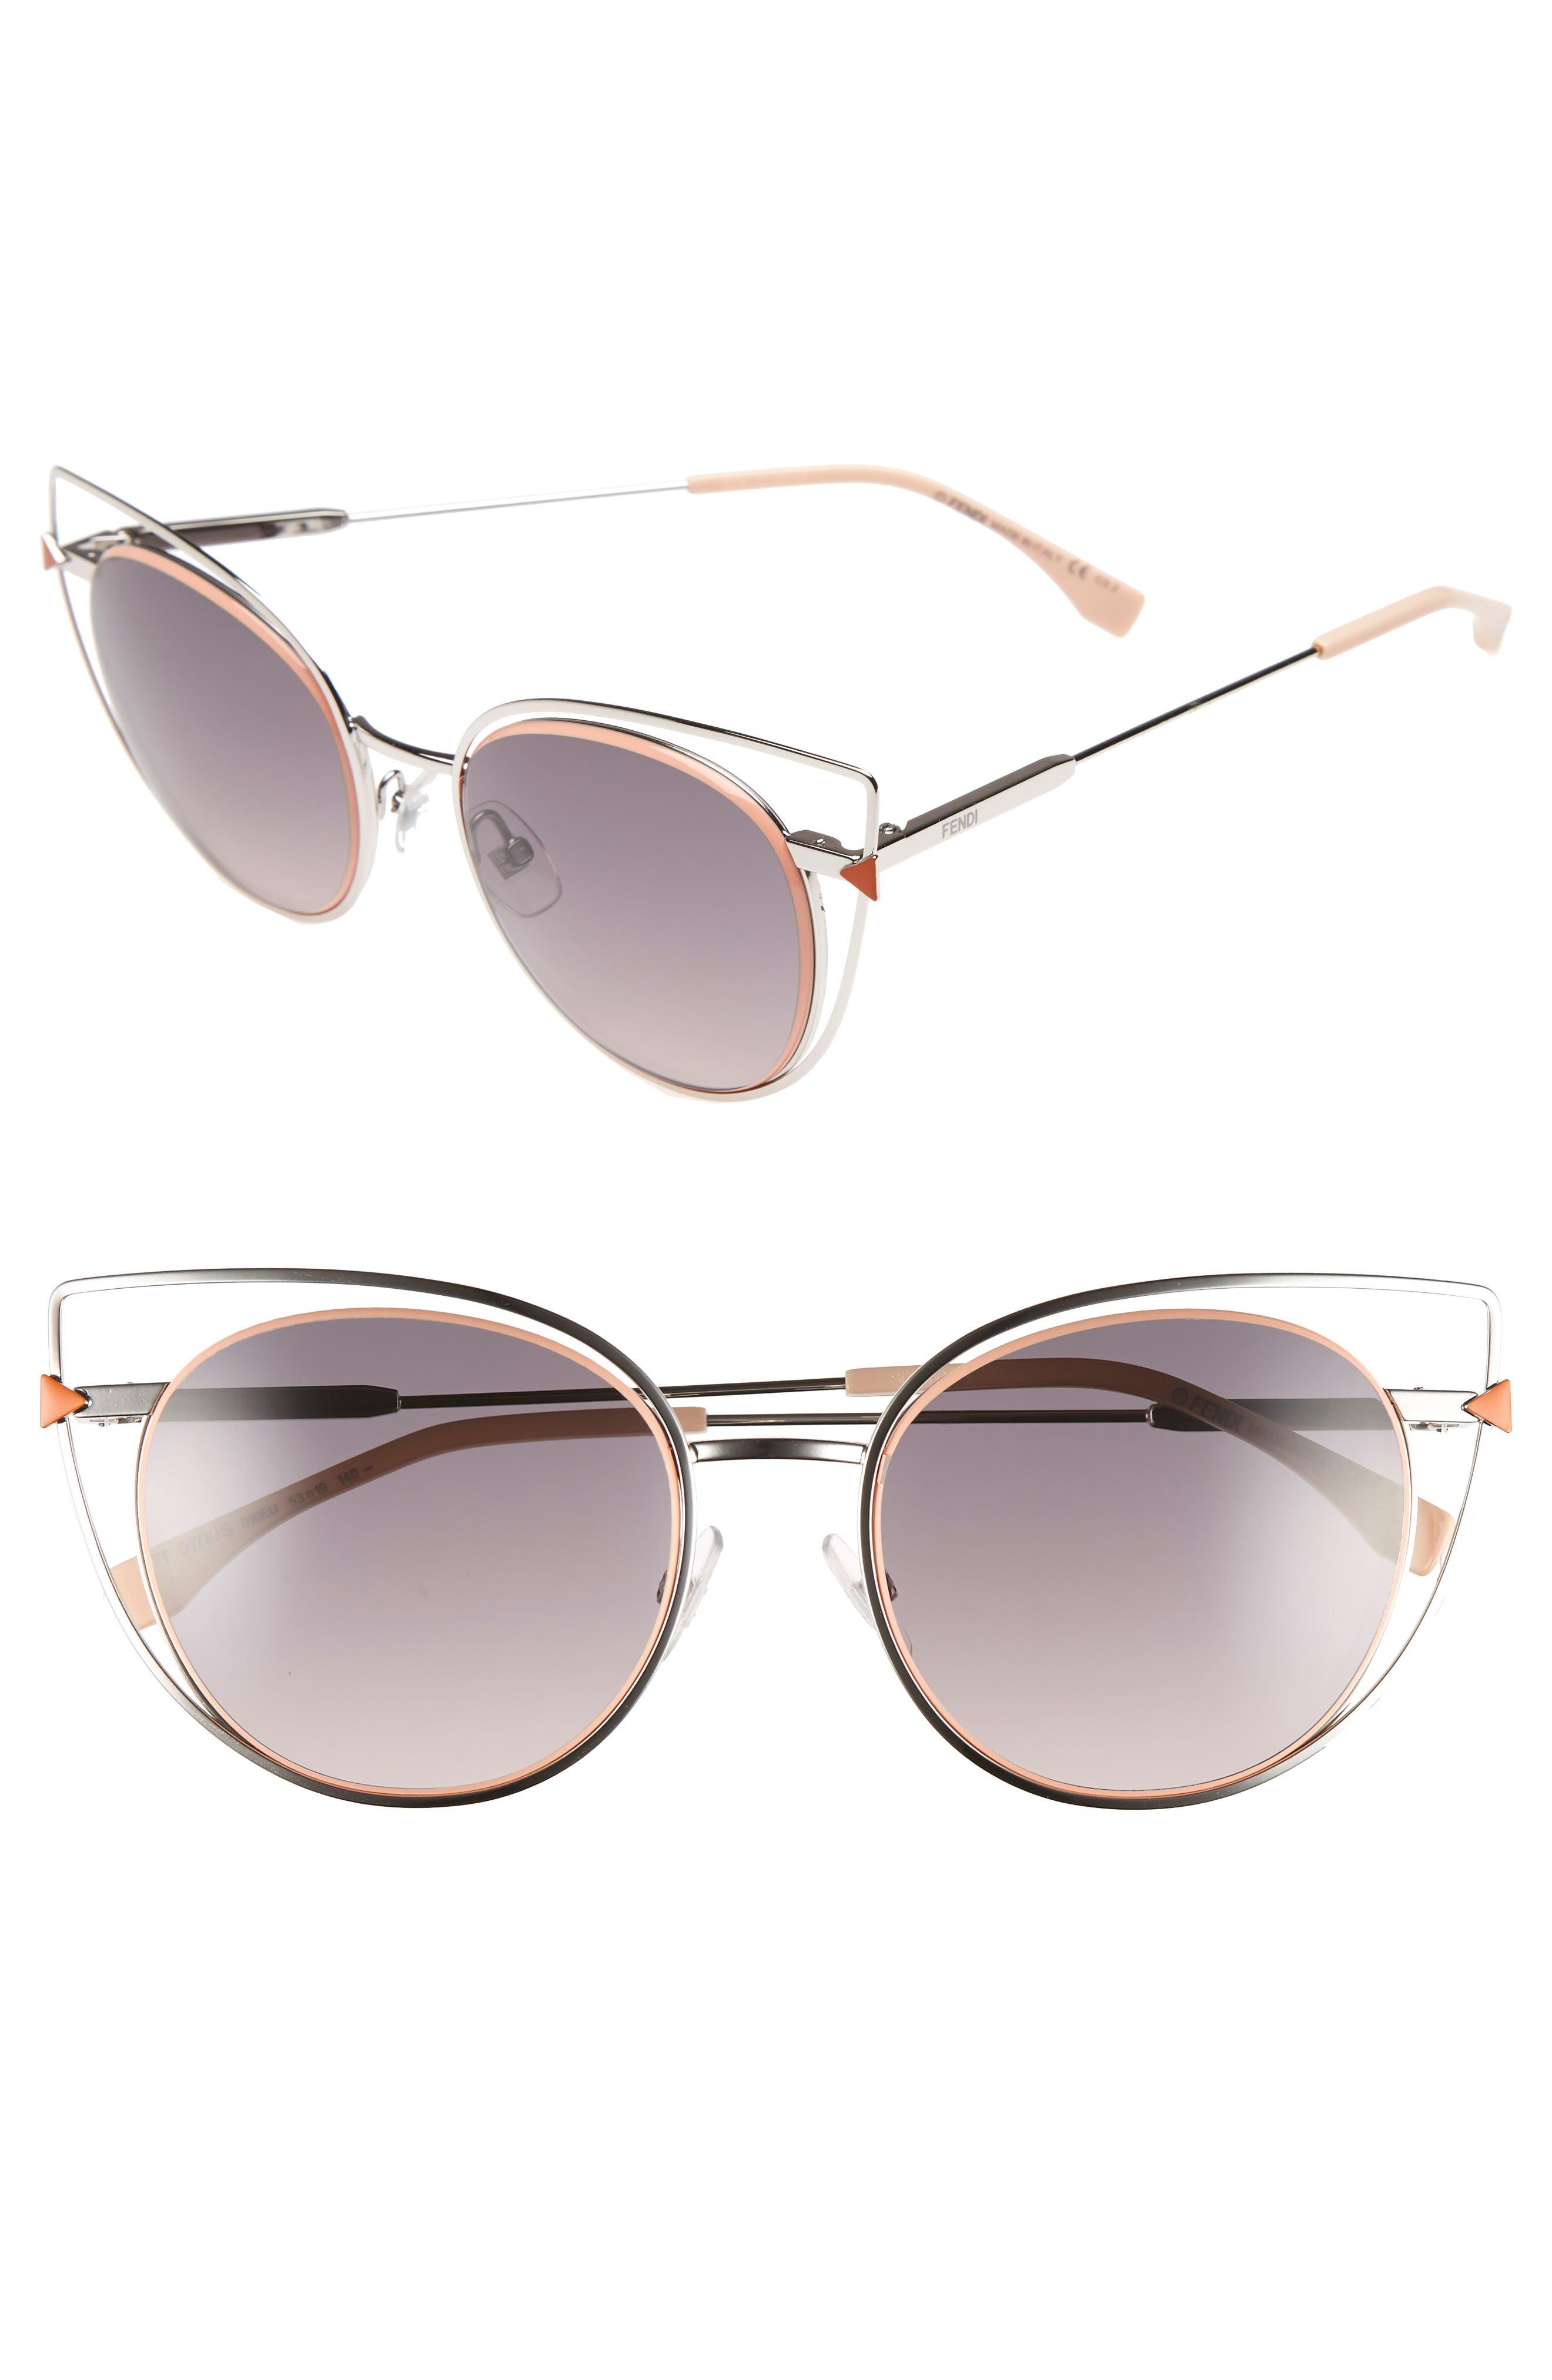 53mm Sunglasses,                             Alternate thumbnail 6, color,